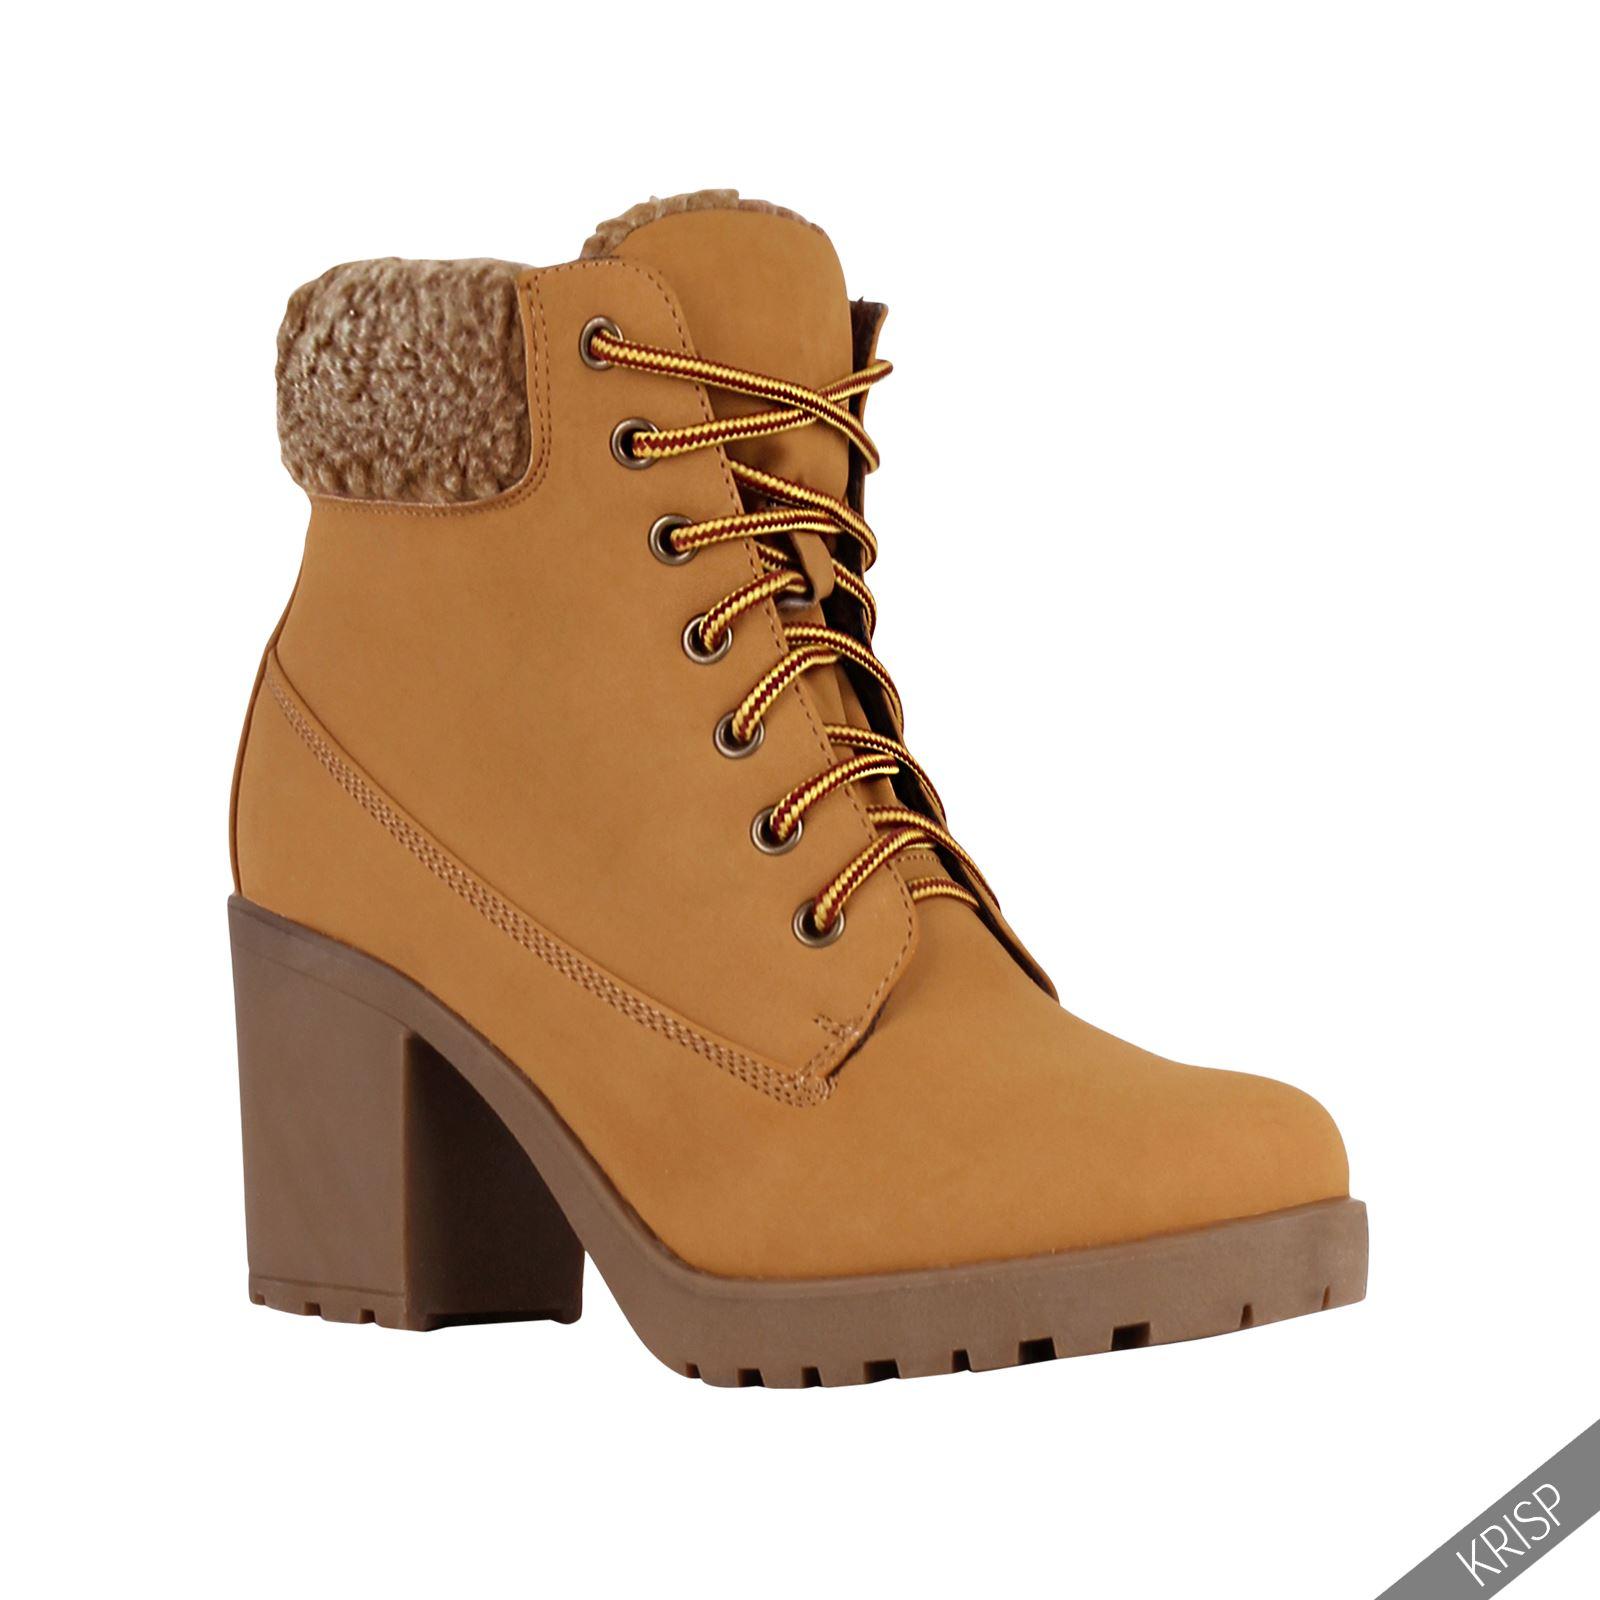 Botines-Mujer-Camel-Bota-Plana-Suela-Goma-Cordones-Casual-Otono-Invierno-Tacon miniatura 27